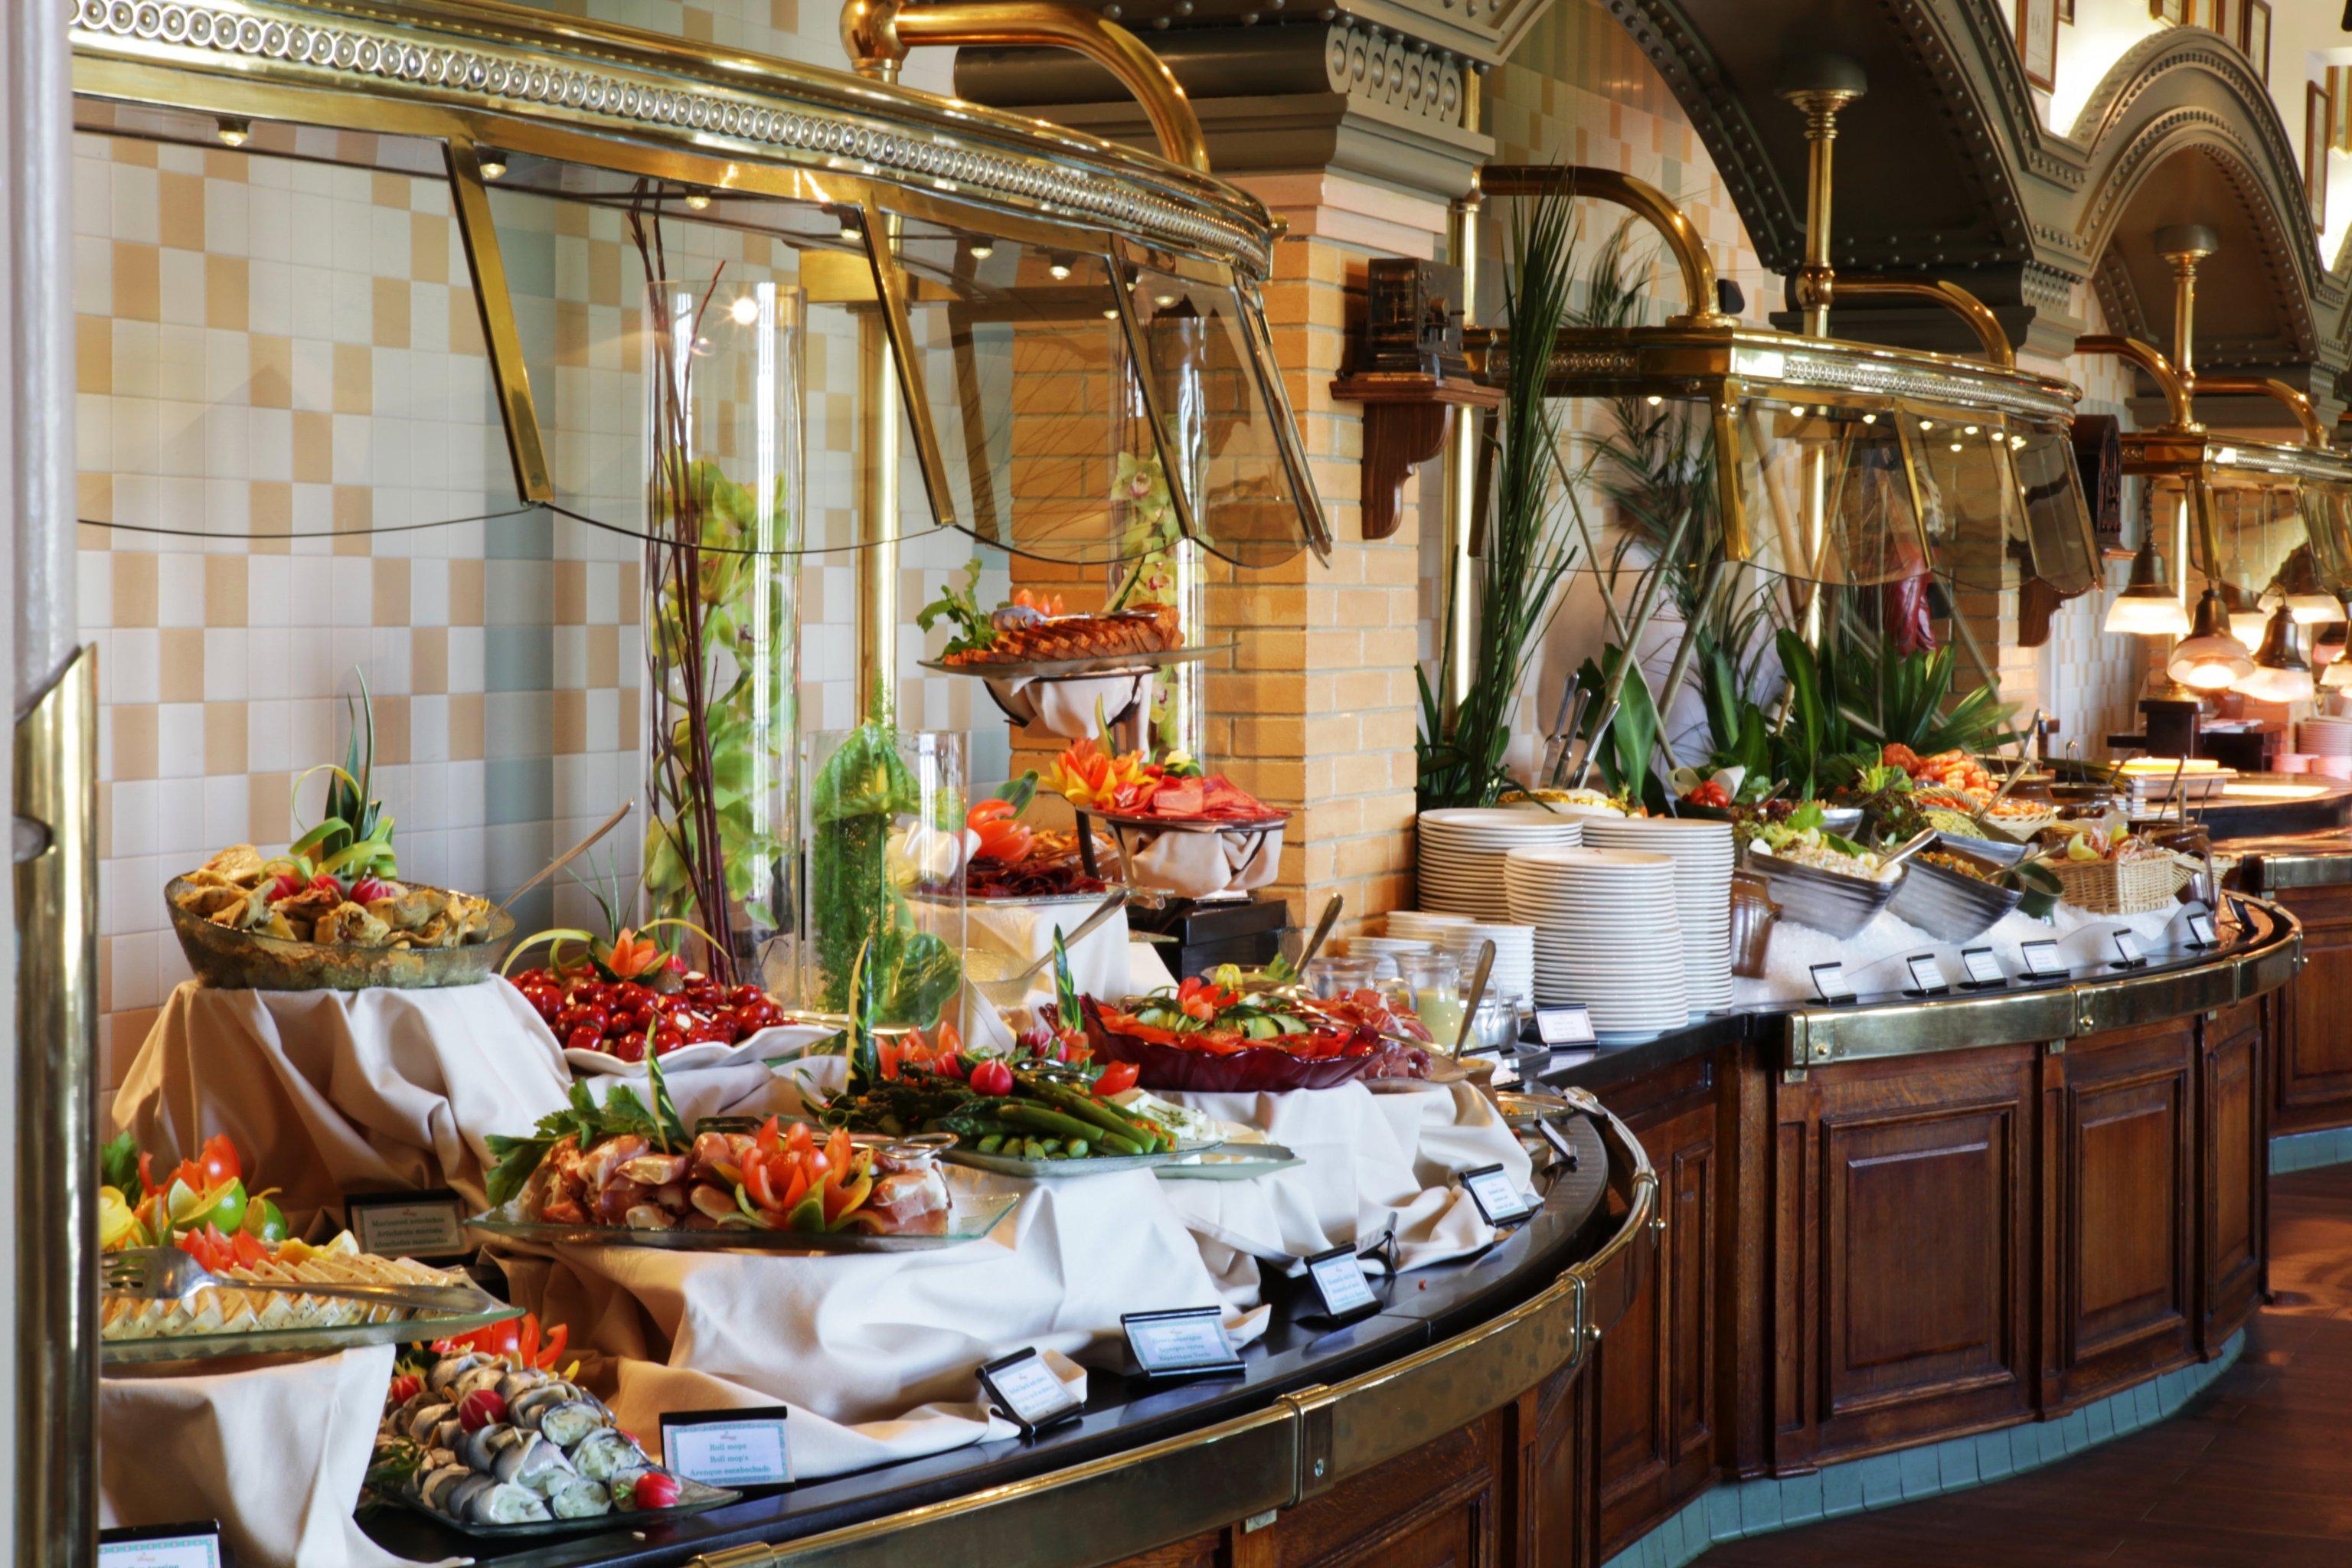 Healthy Restaurants In Western New York